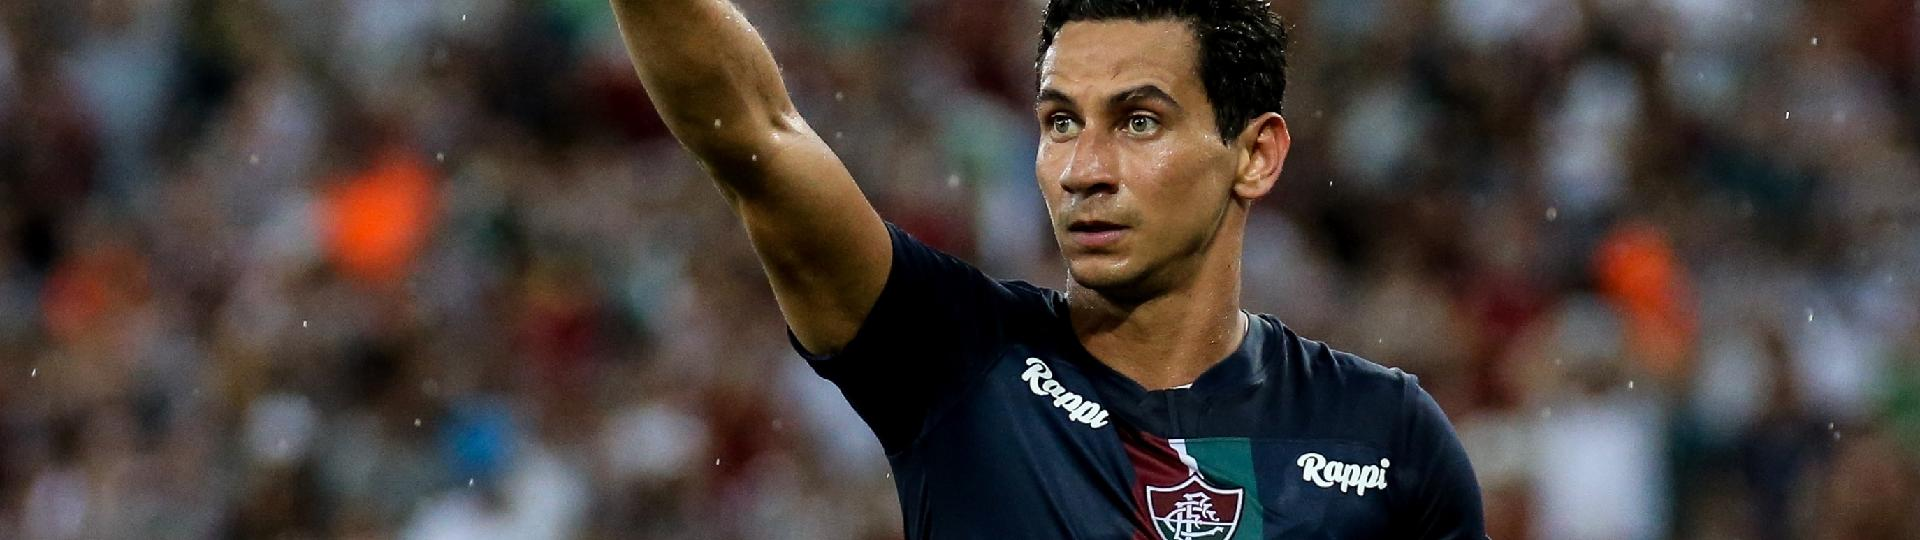 Paulo Henrique Ganso, durante partida entre Fluminense e Bangu